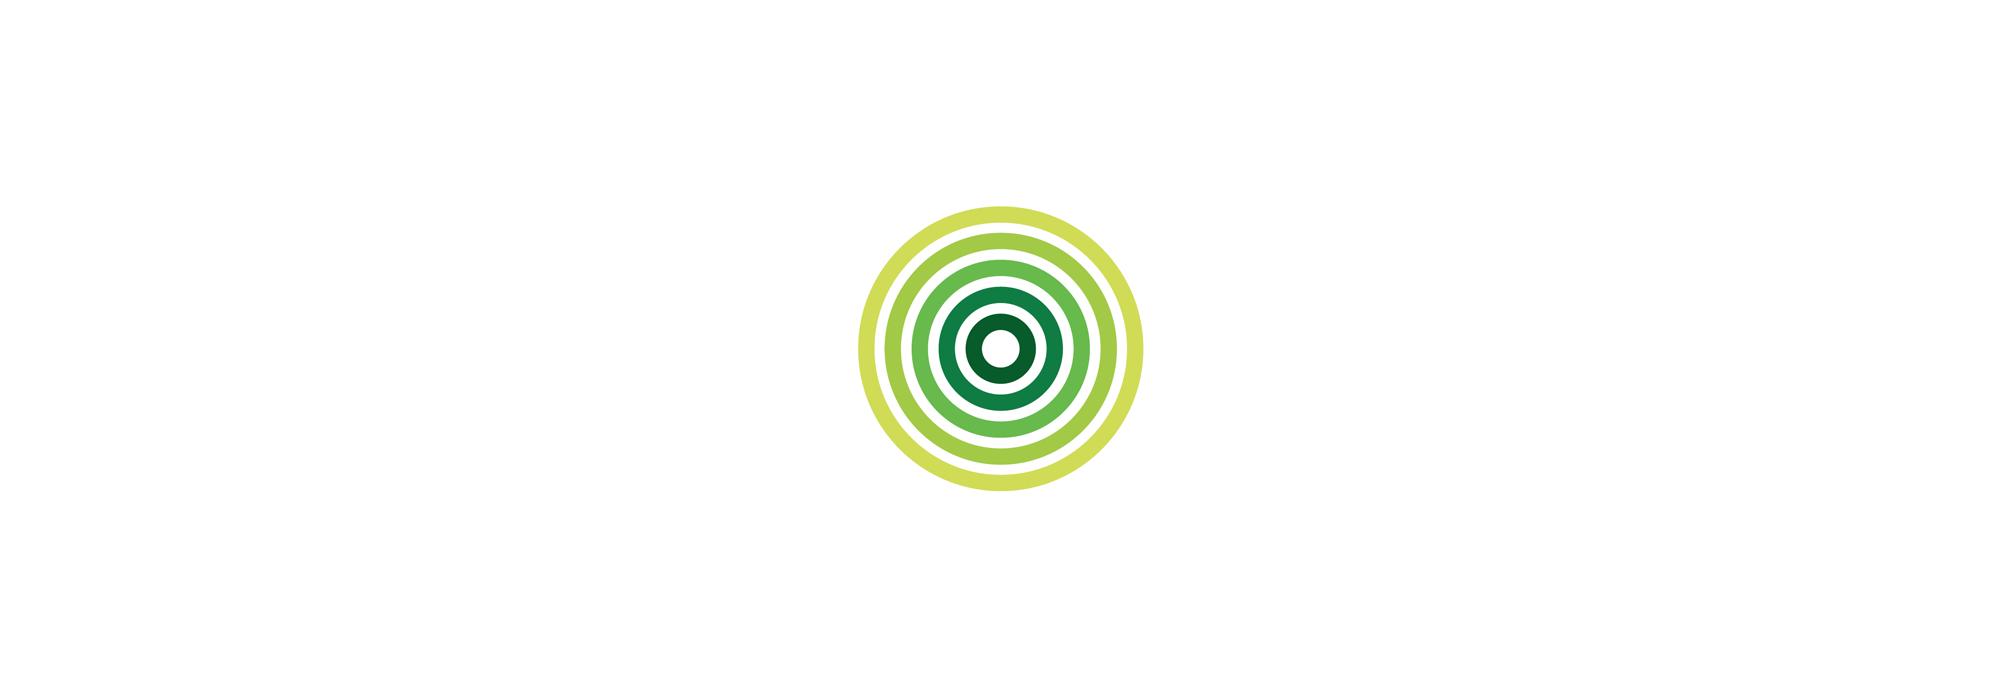 Circular economy icon - featured image